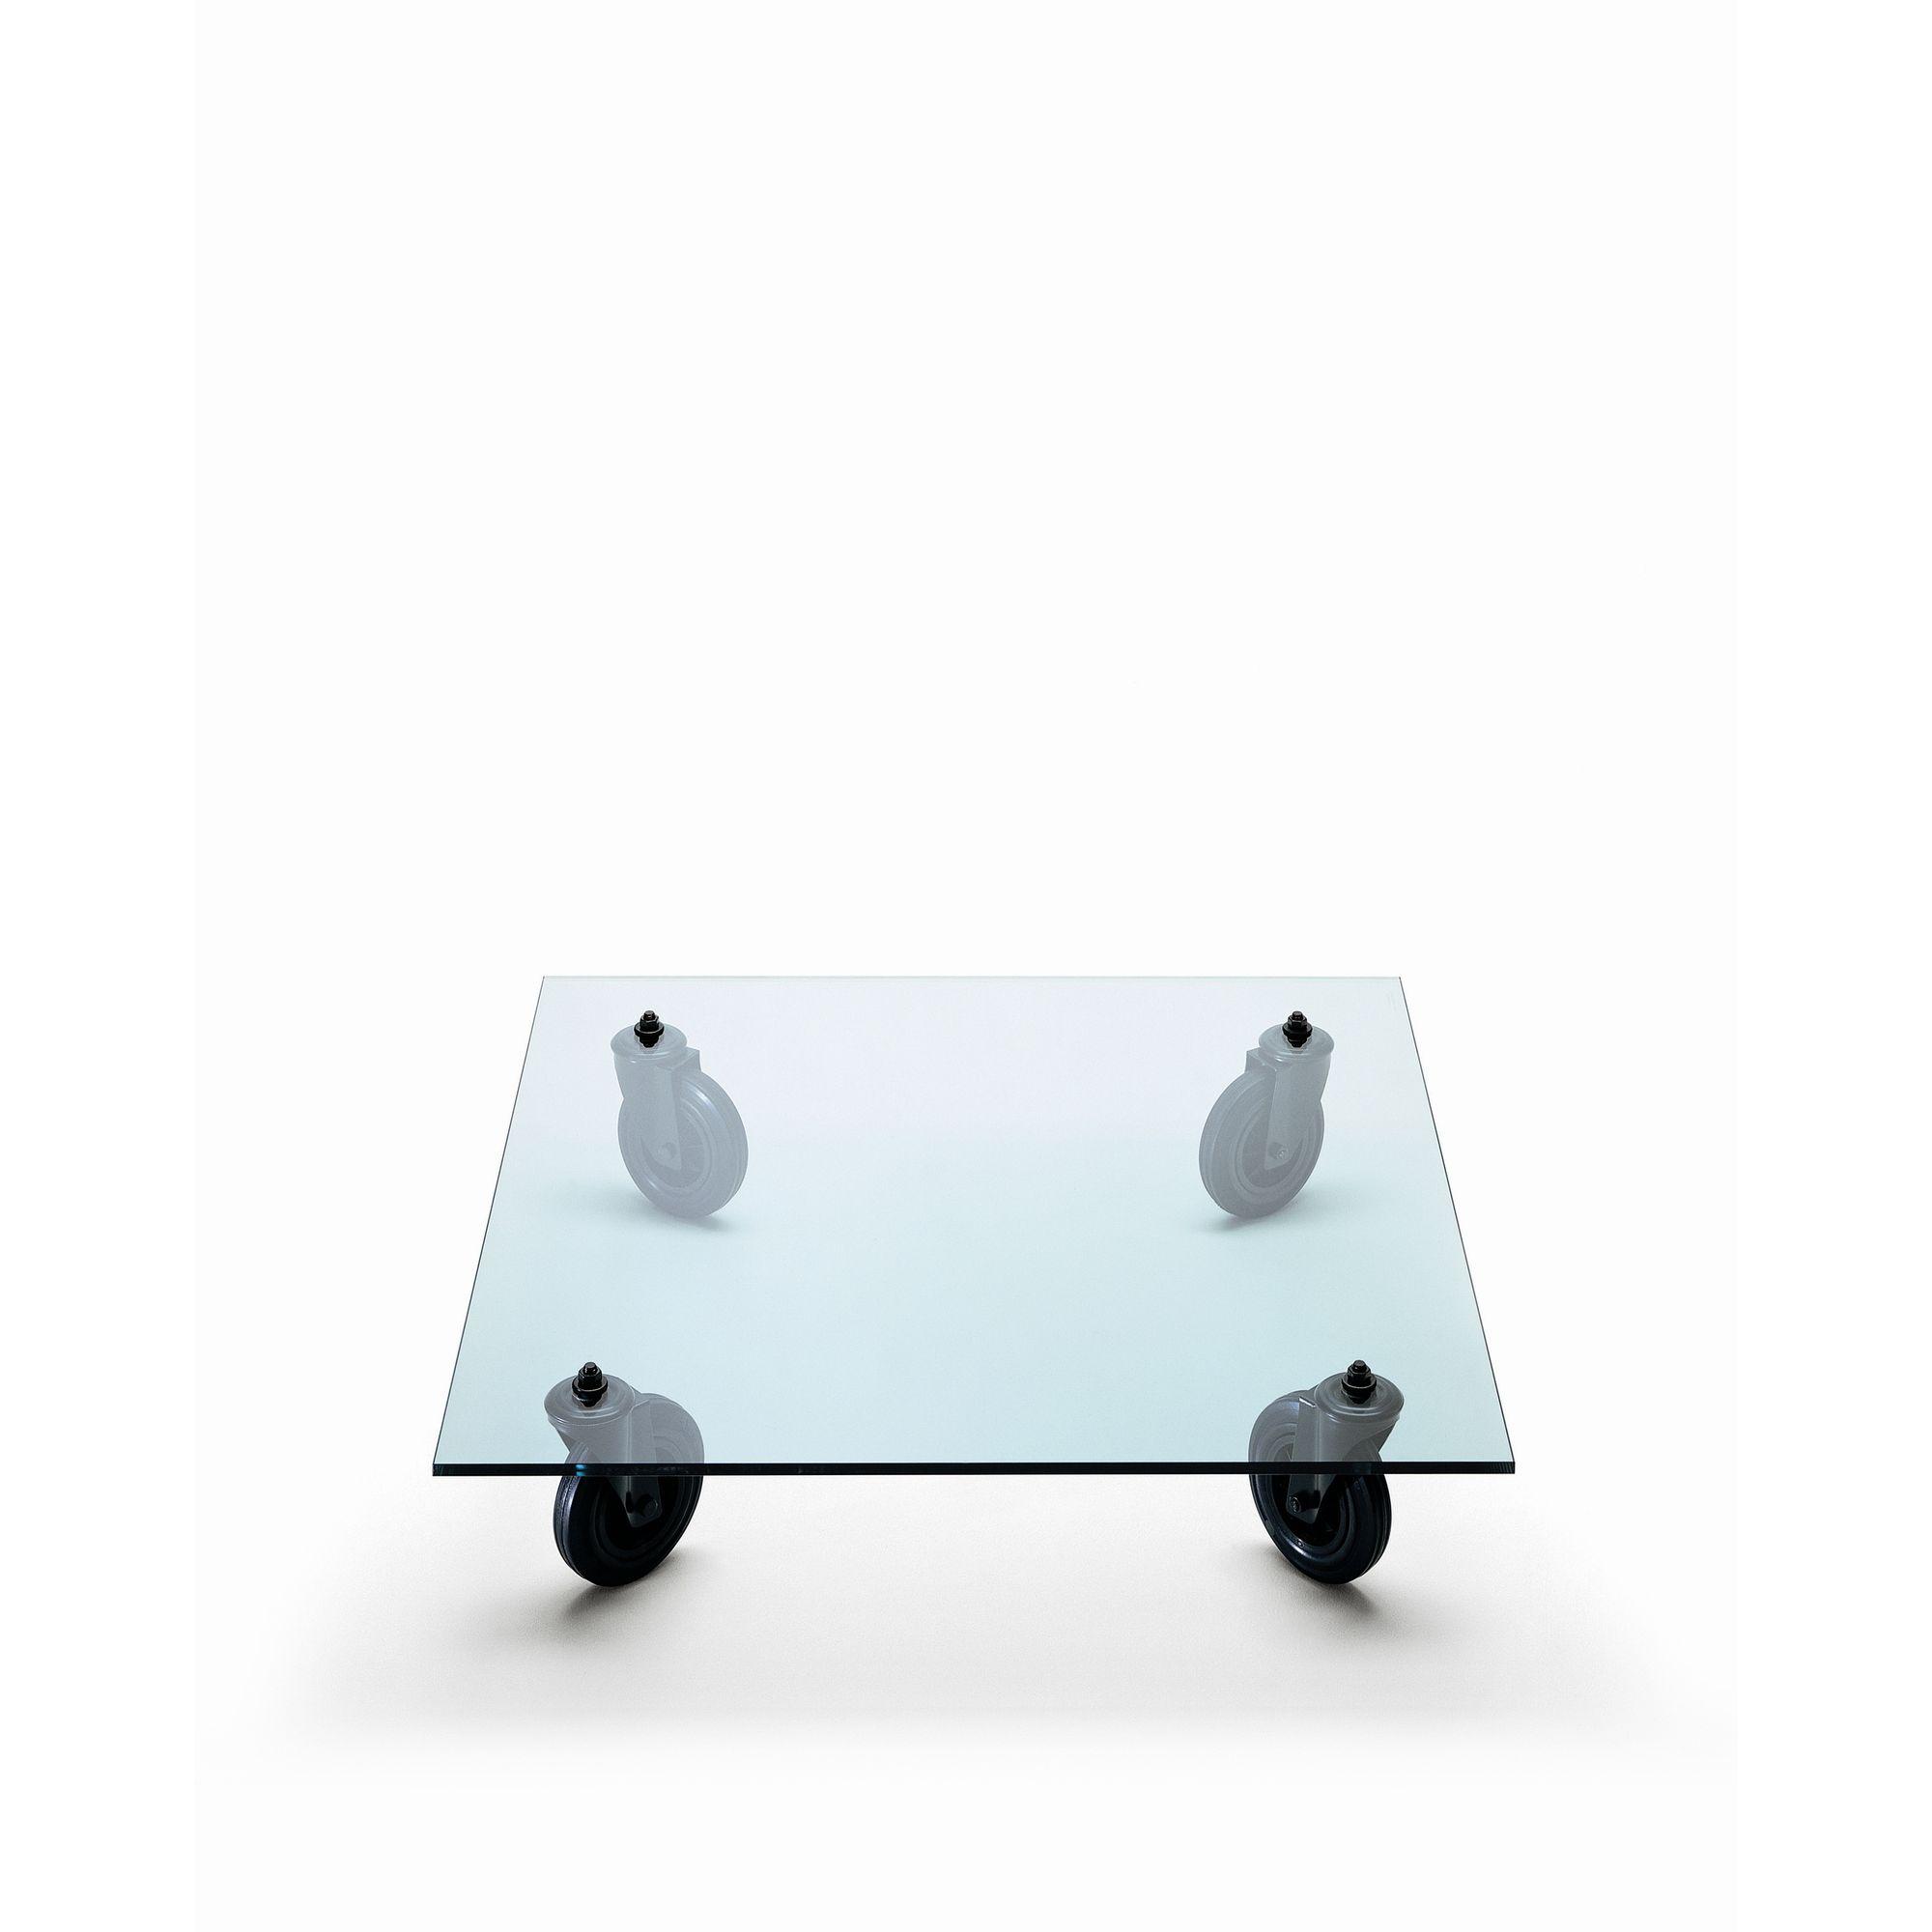 FontanaArte Tavolo Con Route Table - 100cm H X 100cm W X 25cm D at Tesco Direct